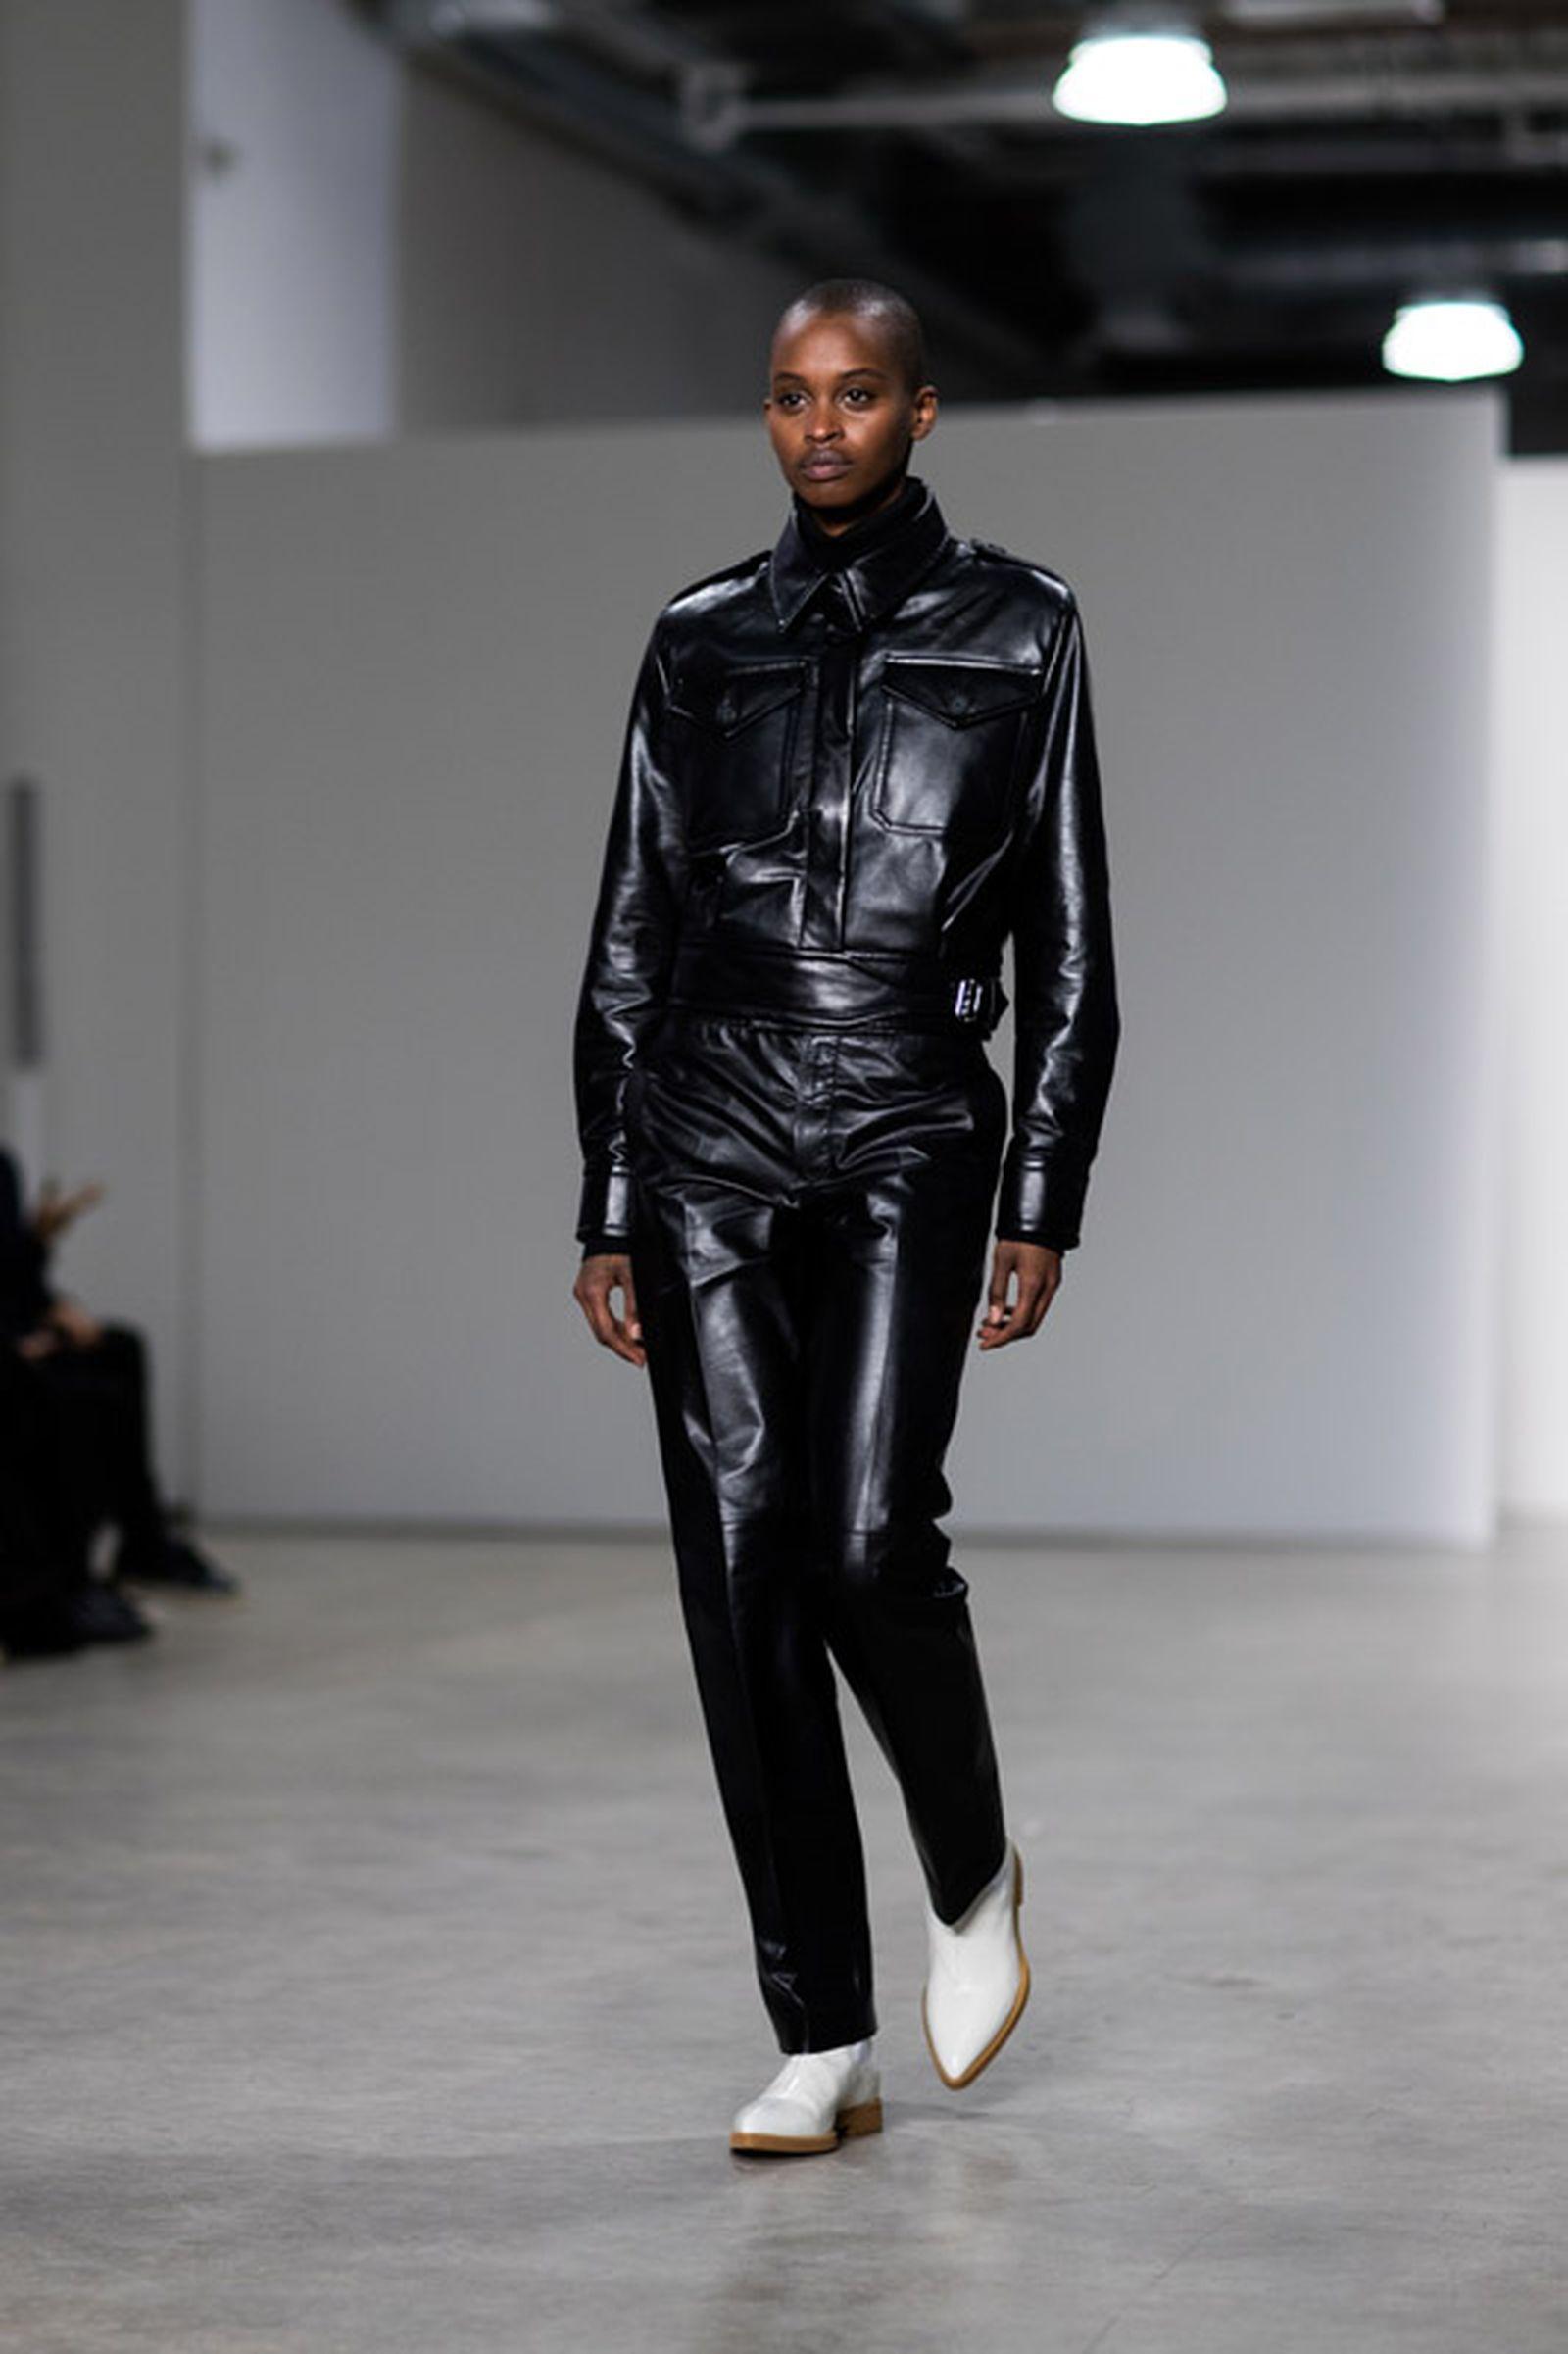 14helmut lang fw19 new york fashion week nyfw